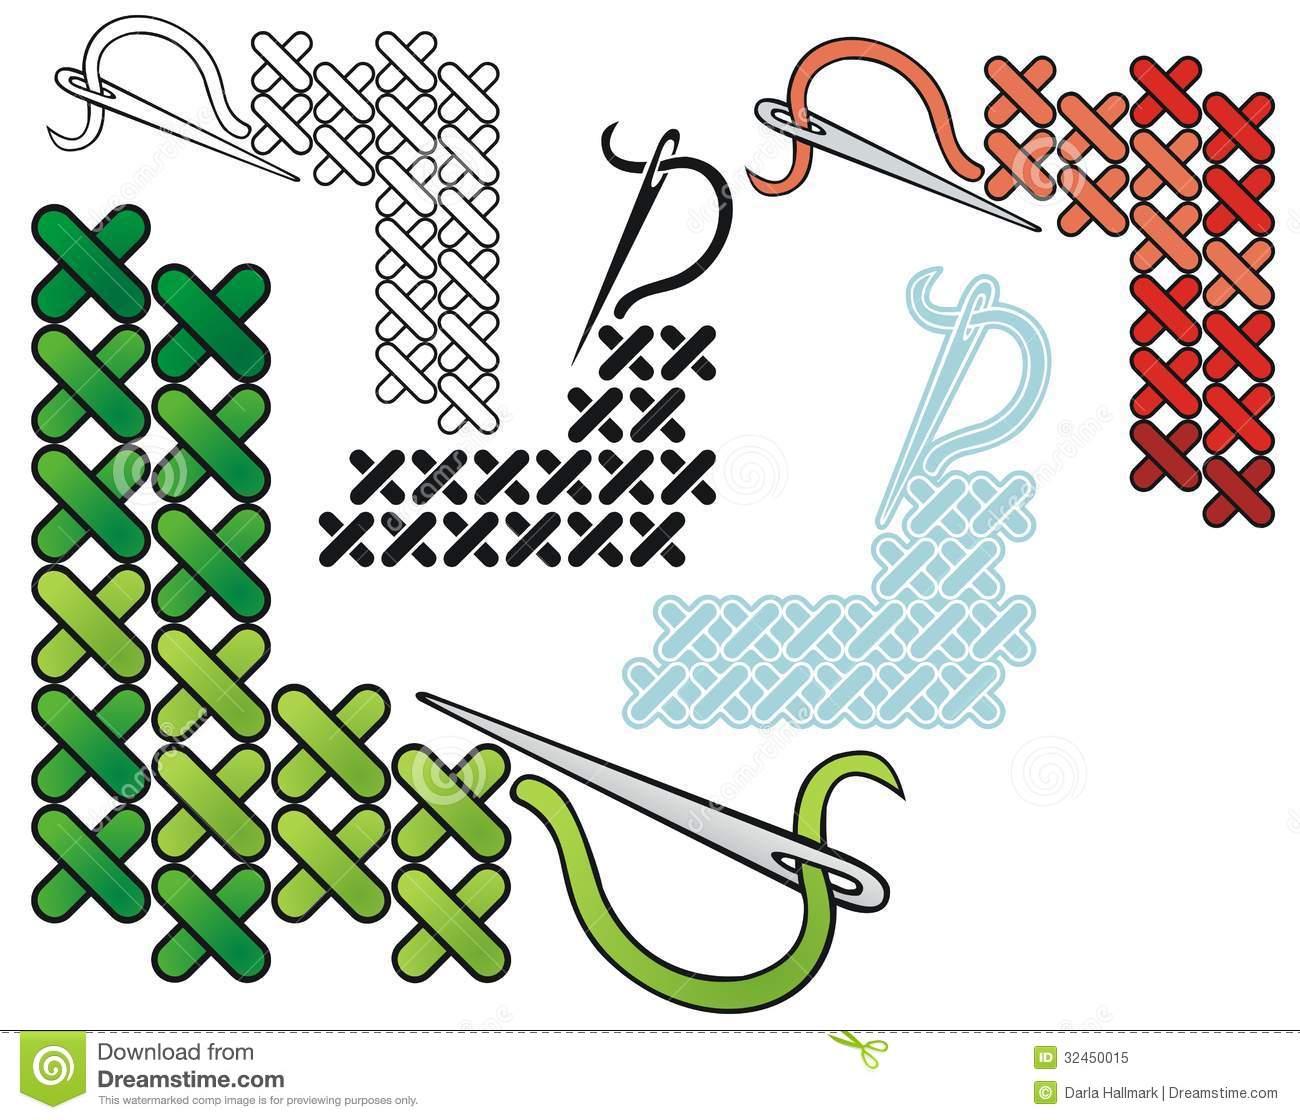 cross-sch-clipart-2 Home Sweet Embroidery Design Free on free embroidery free designs, sweet dreams machine embroidery design, free xmas embroidery designs, free vp3 embroidery designs, sweet things to draw, free pes 4x4 embroidery designs, free monogram designs, free baby embroidery designs, free christmas embroidery designs, free downloadable machine embroidery designs,